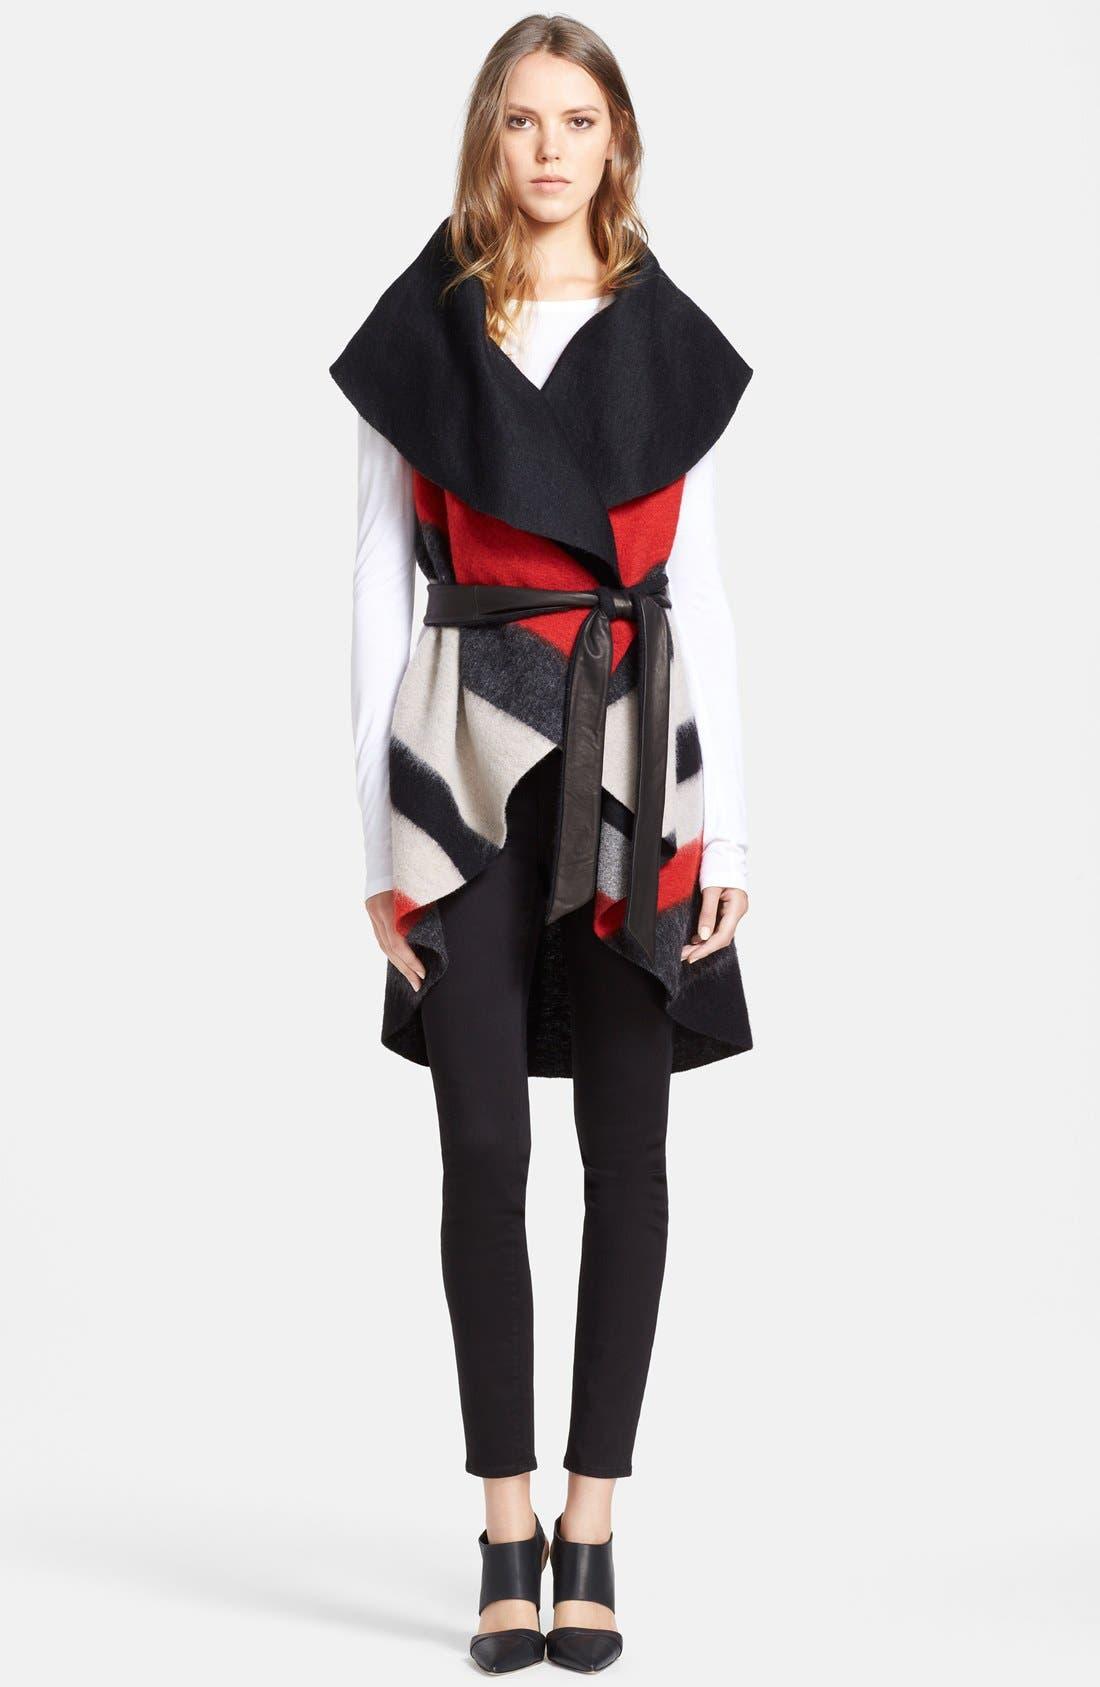 Main Image - Alice + Olivia 'Keira' Sleeveless Wool Blend Wrap with Leather Belt